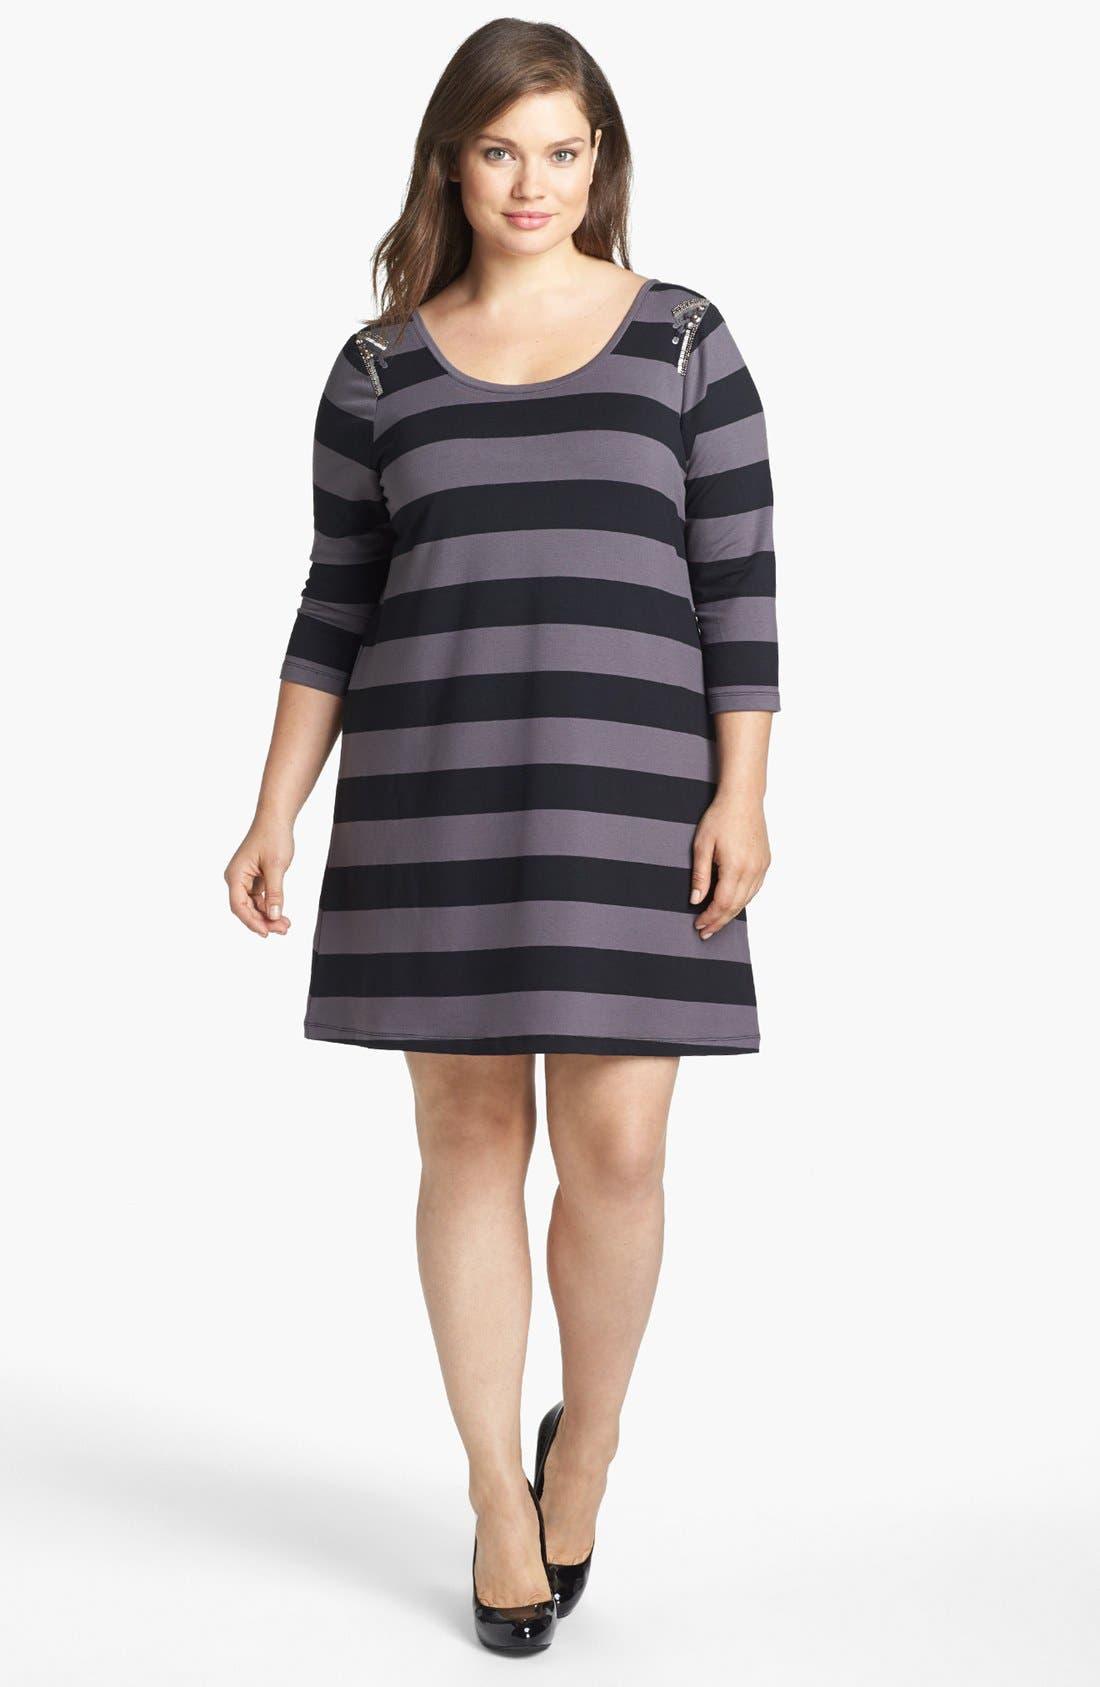 Main Image - Jessica Simpson 'Joey' Embellished Stripe Knit Dress (Plus Size)